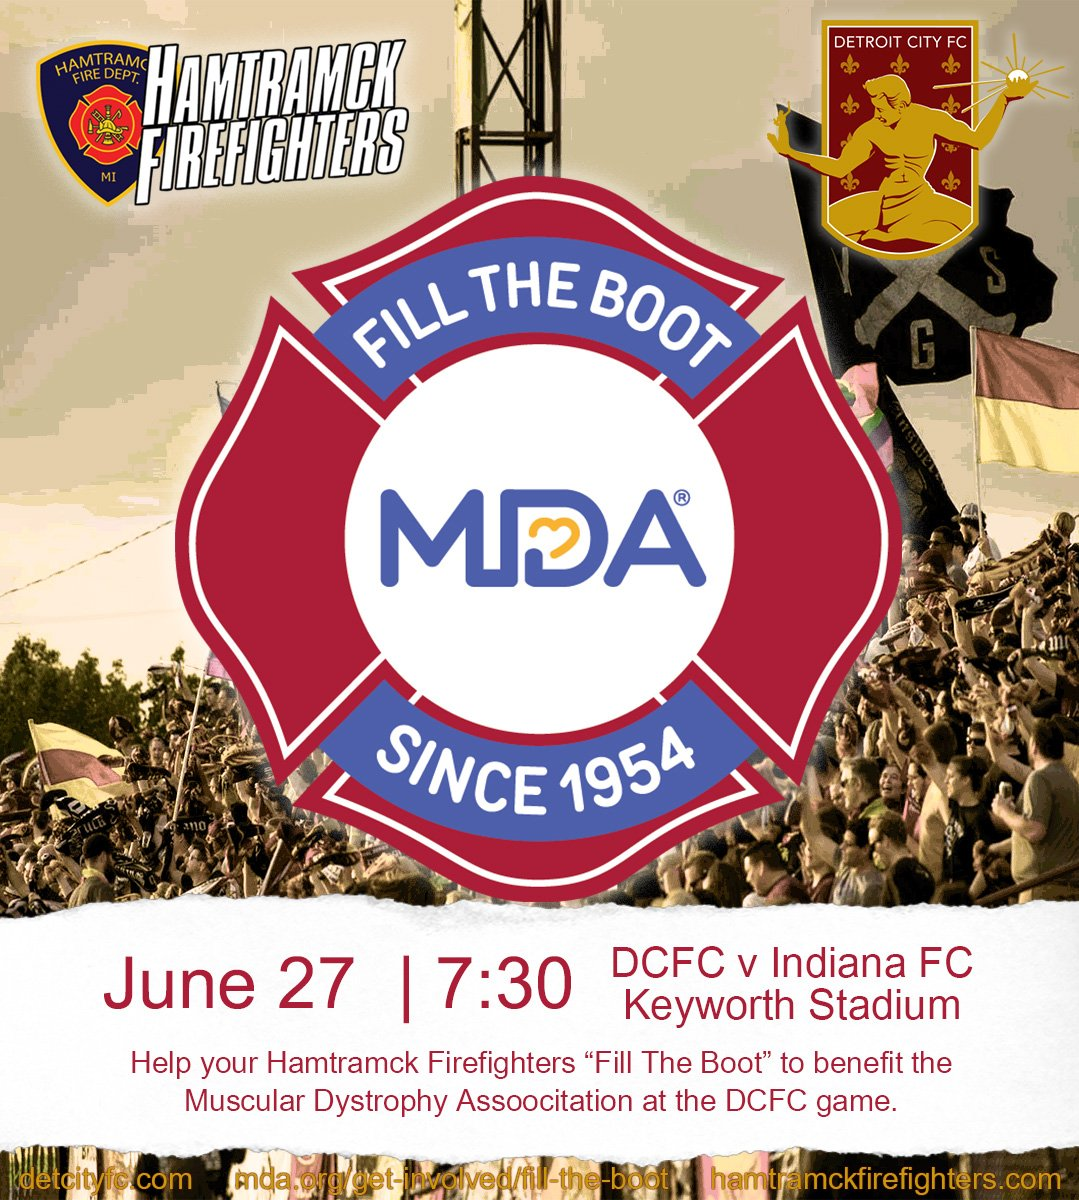 Today at @DetroitCityFC help Fill the Boot for @MDADetroit. #hamtramck #mda #filltheboot #iaff #dcfc #detroitcity #football #soccer #DCTID<br>http://pic.twitter.com/fs2eVu4fKM